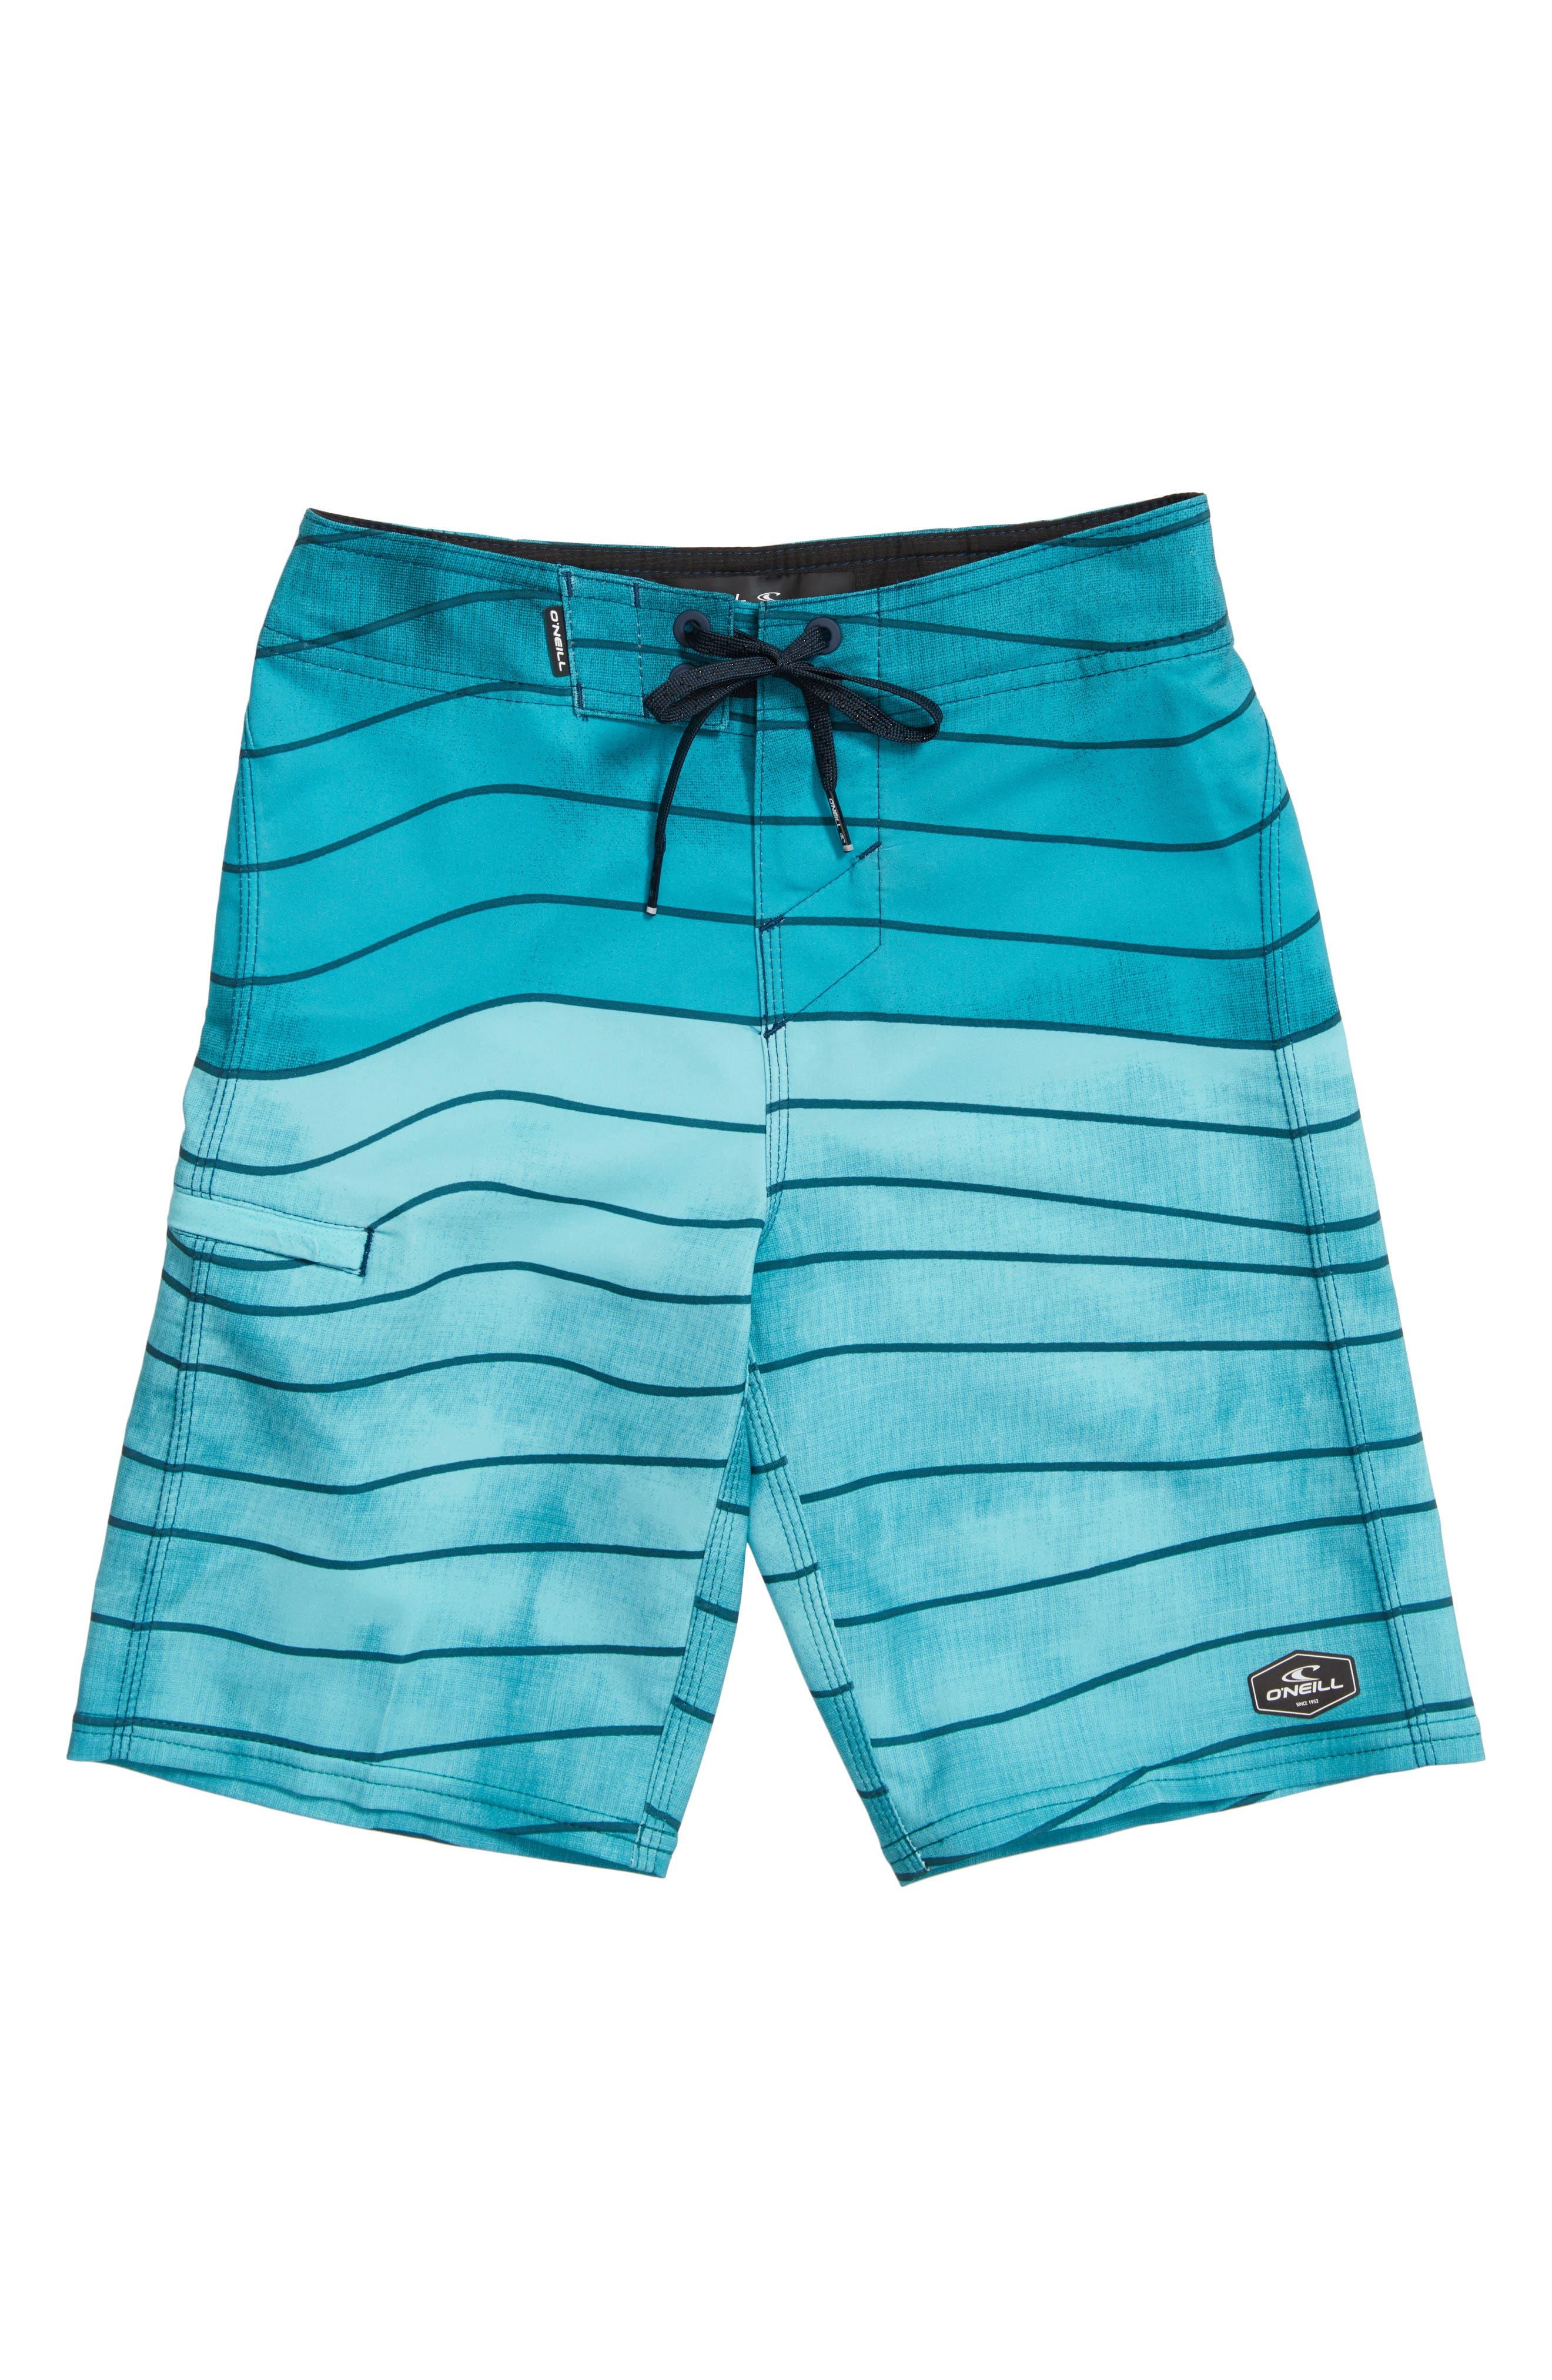 Hyperfreak Swell Stripe Board Shorts,                             Main thumbnail 2, color,